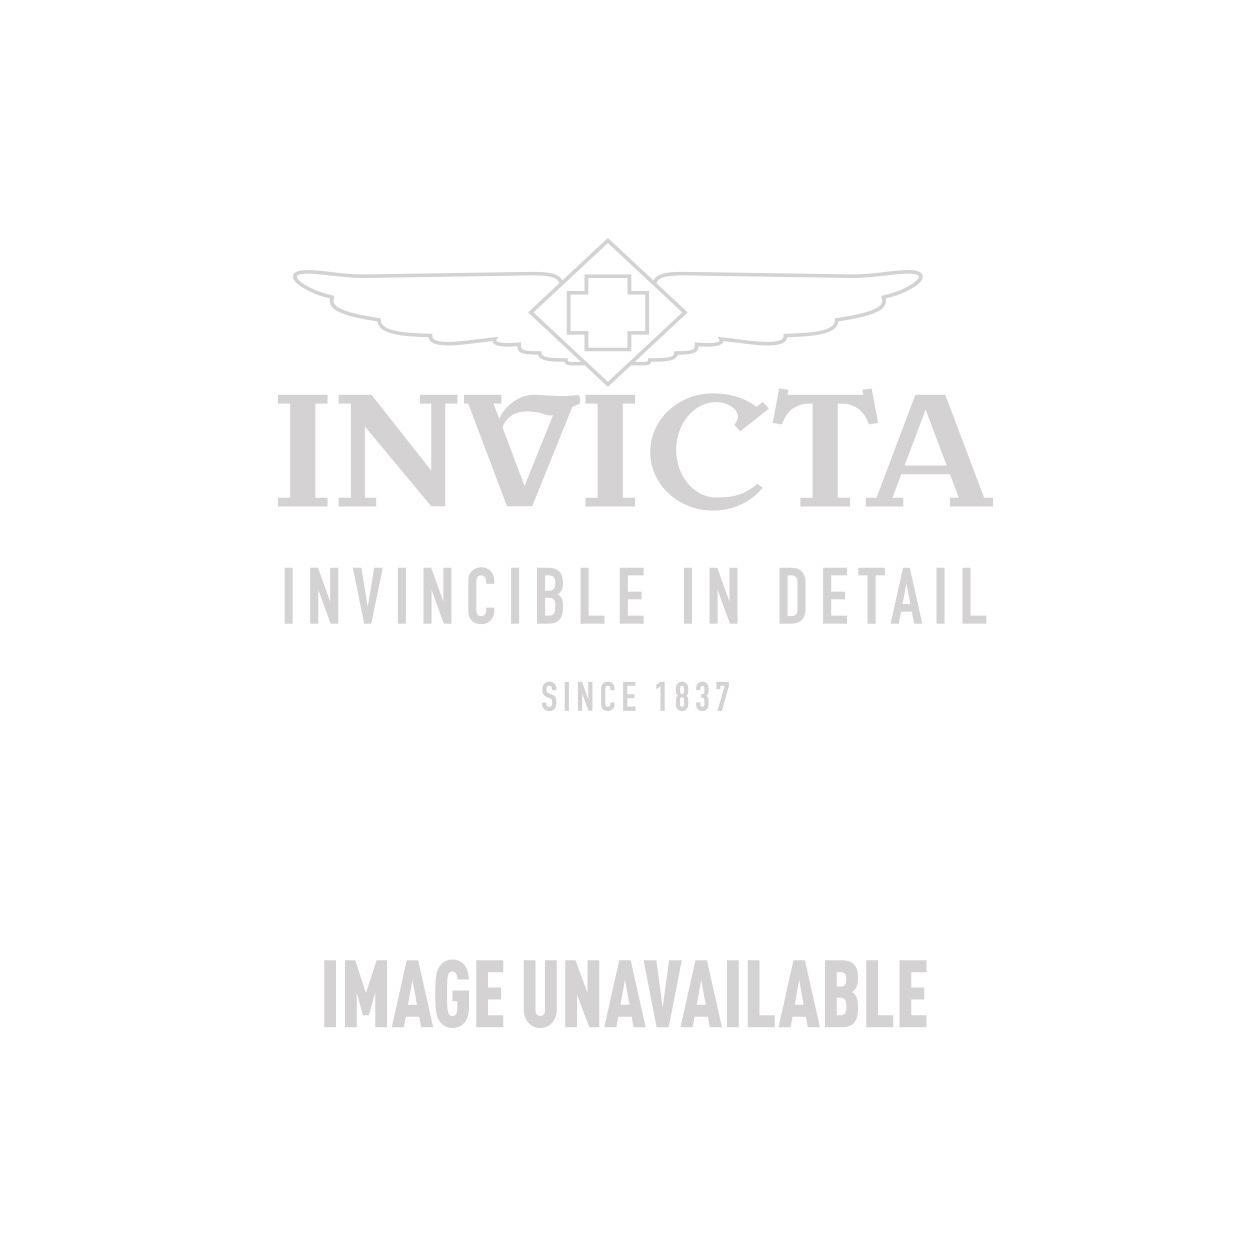 Invicta Aviator Quartz Watch - Gold, Stainless Steel case with Steel, Gold tone Stainless Steel band - Model 18851